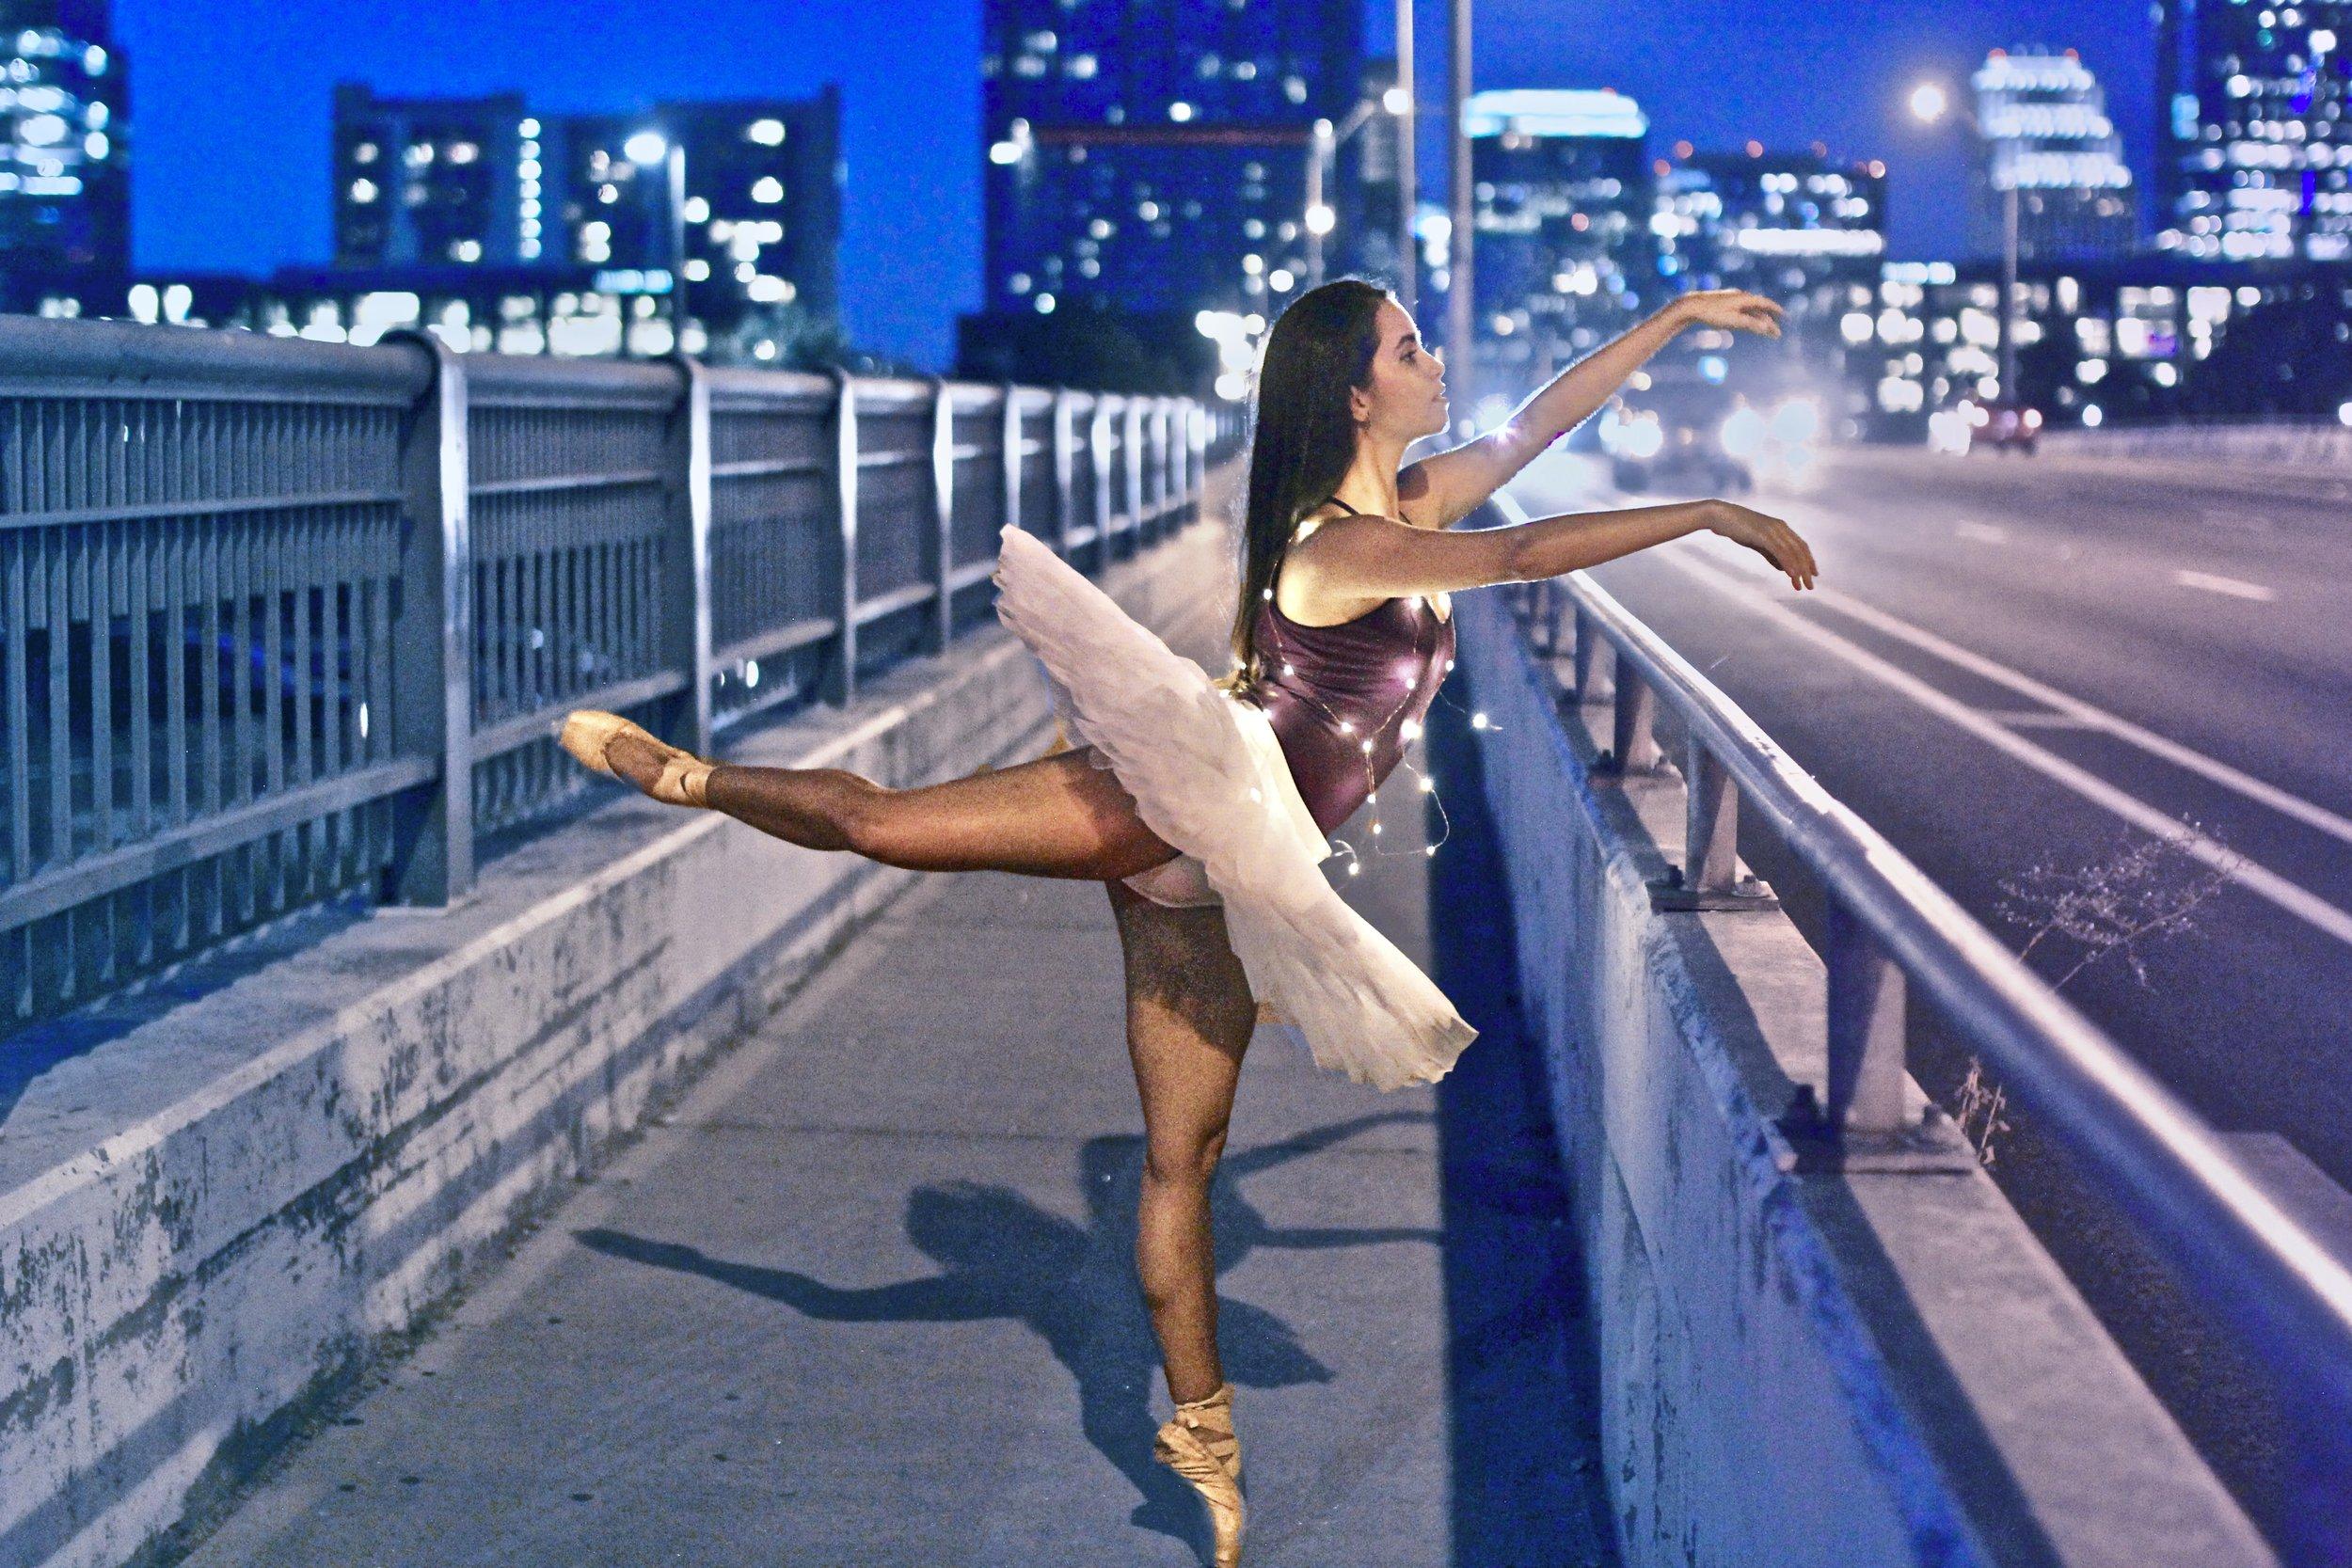 Octopi Digital focuses on marketing Eglevsky Ballet's brand message; 'Long Island's Premier Ballet Academy.'